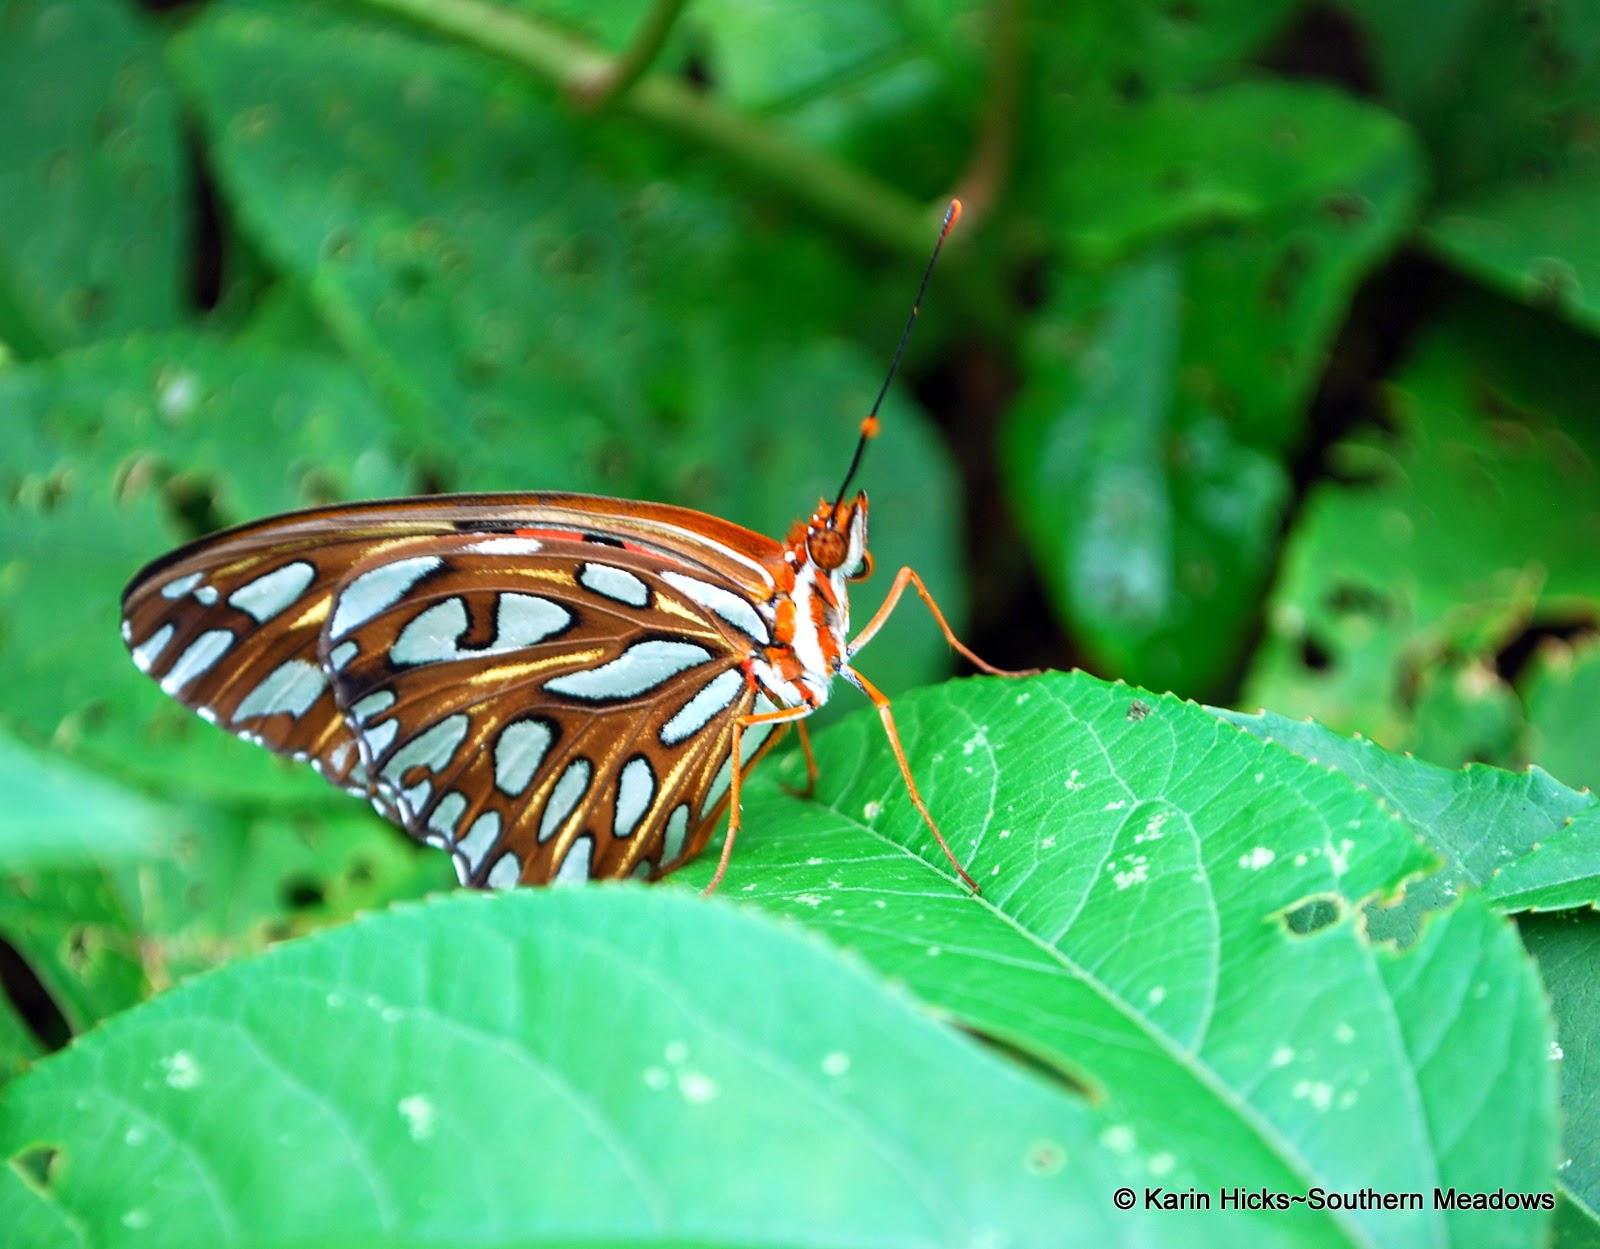 Southern Meadows: Beyong Butterflies